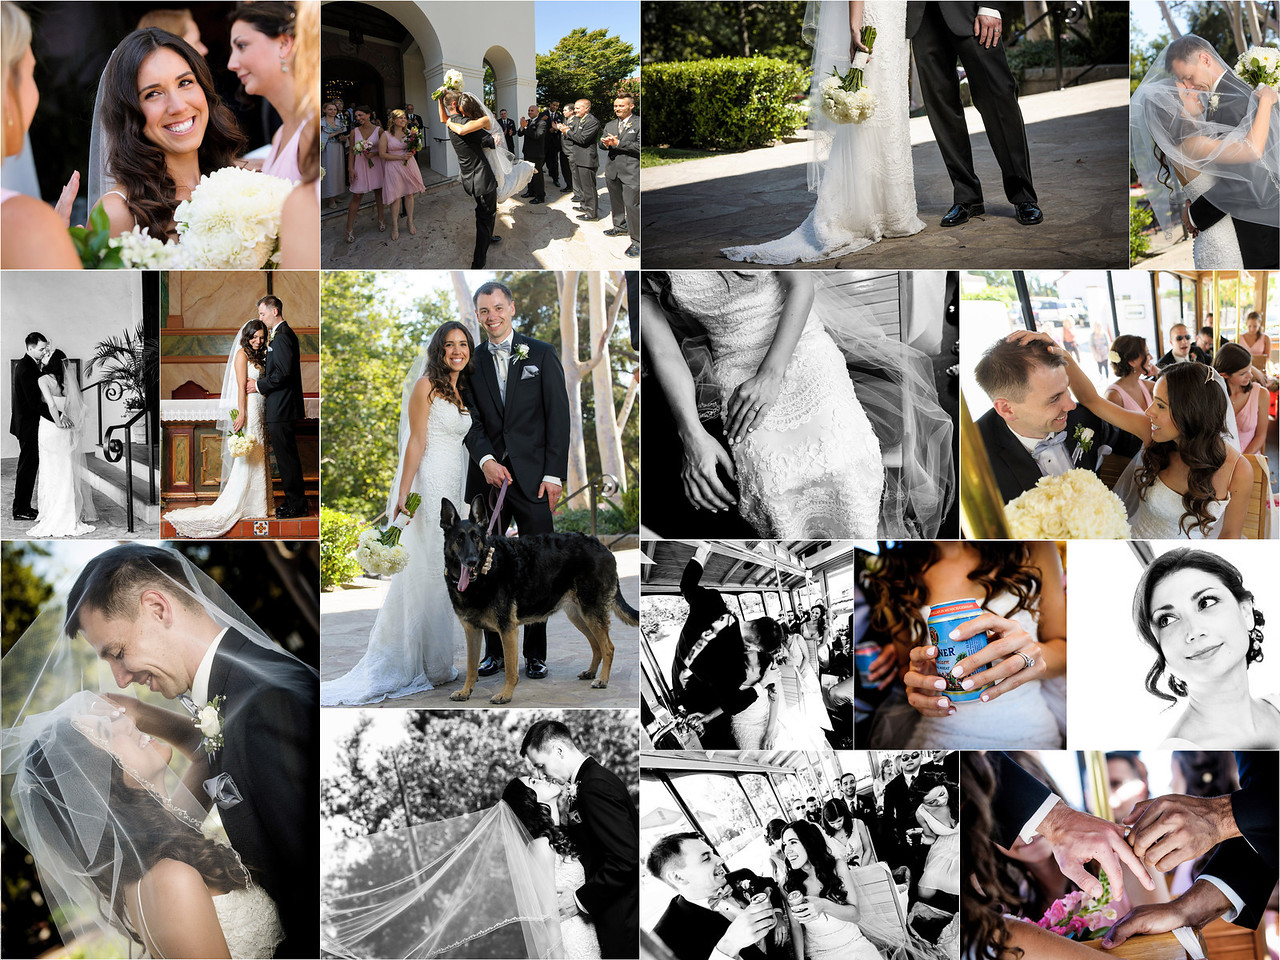 Jenny_and_Dimitriy_Wedding_Photography_4x6_Photo_Board_04